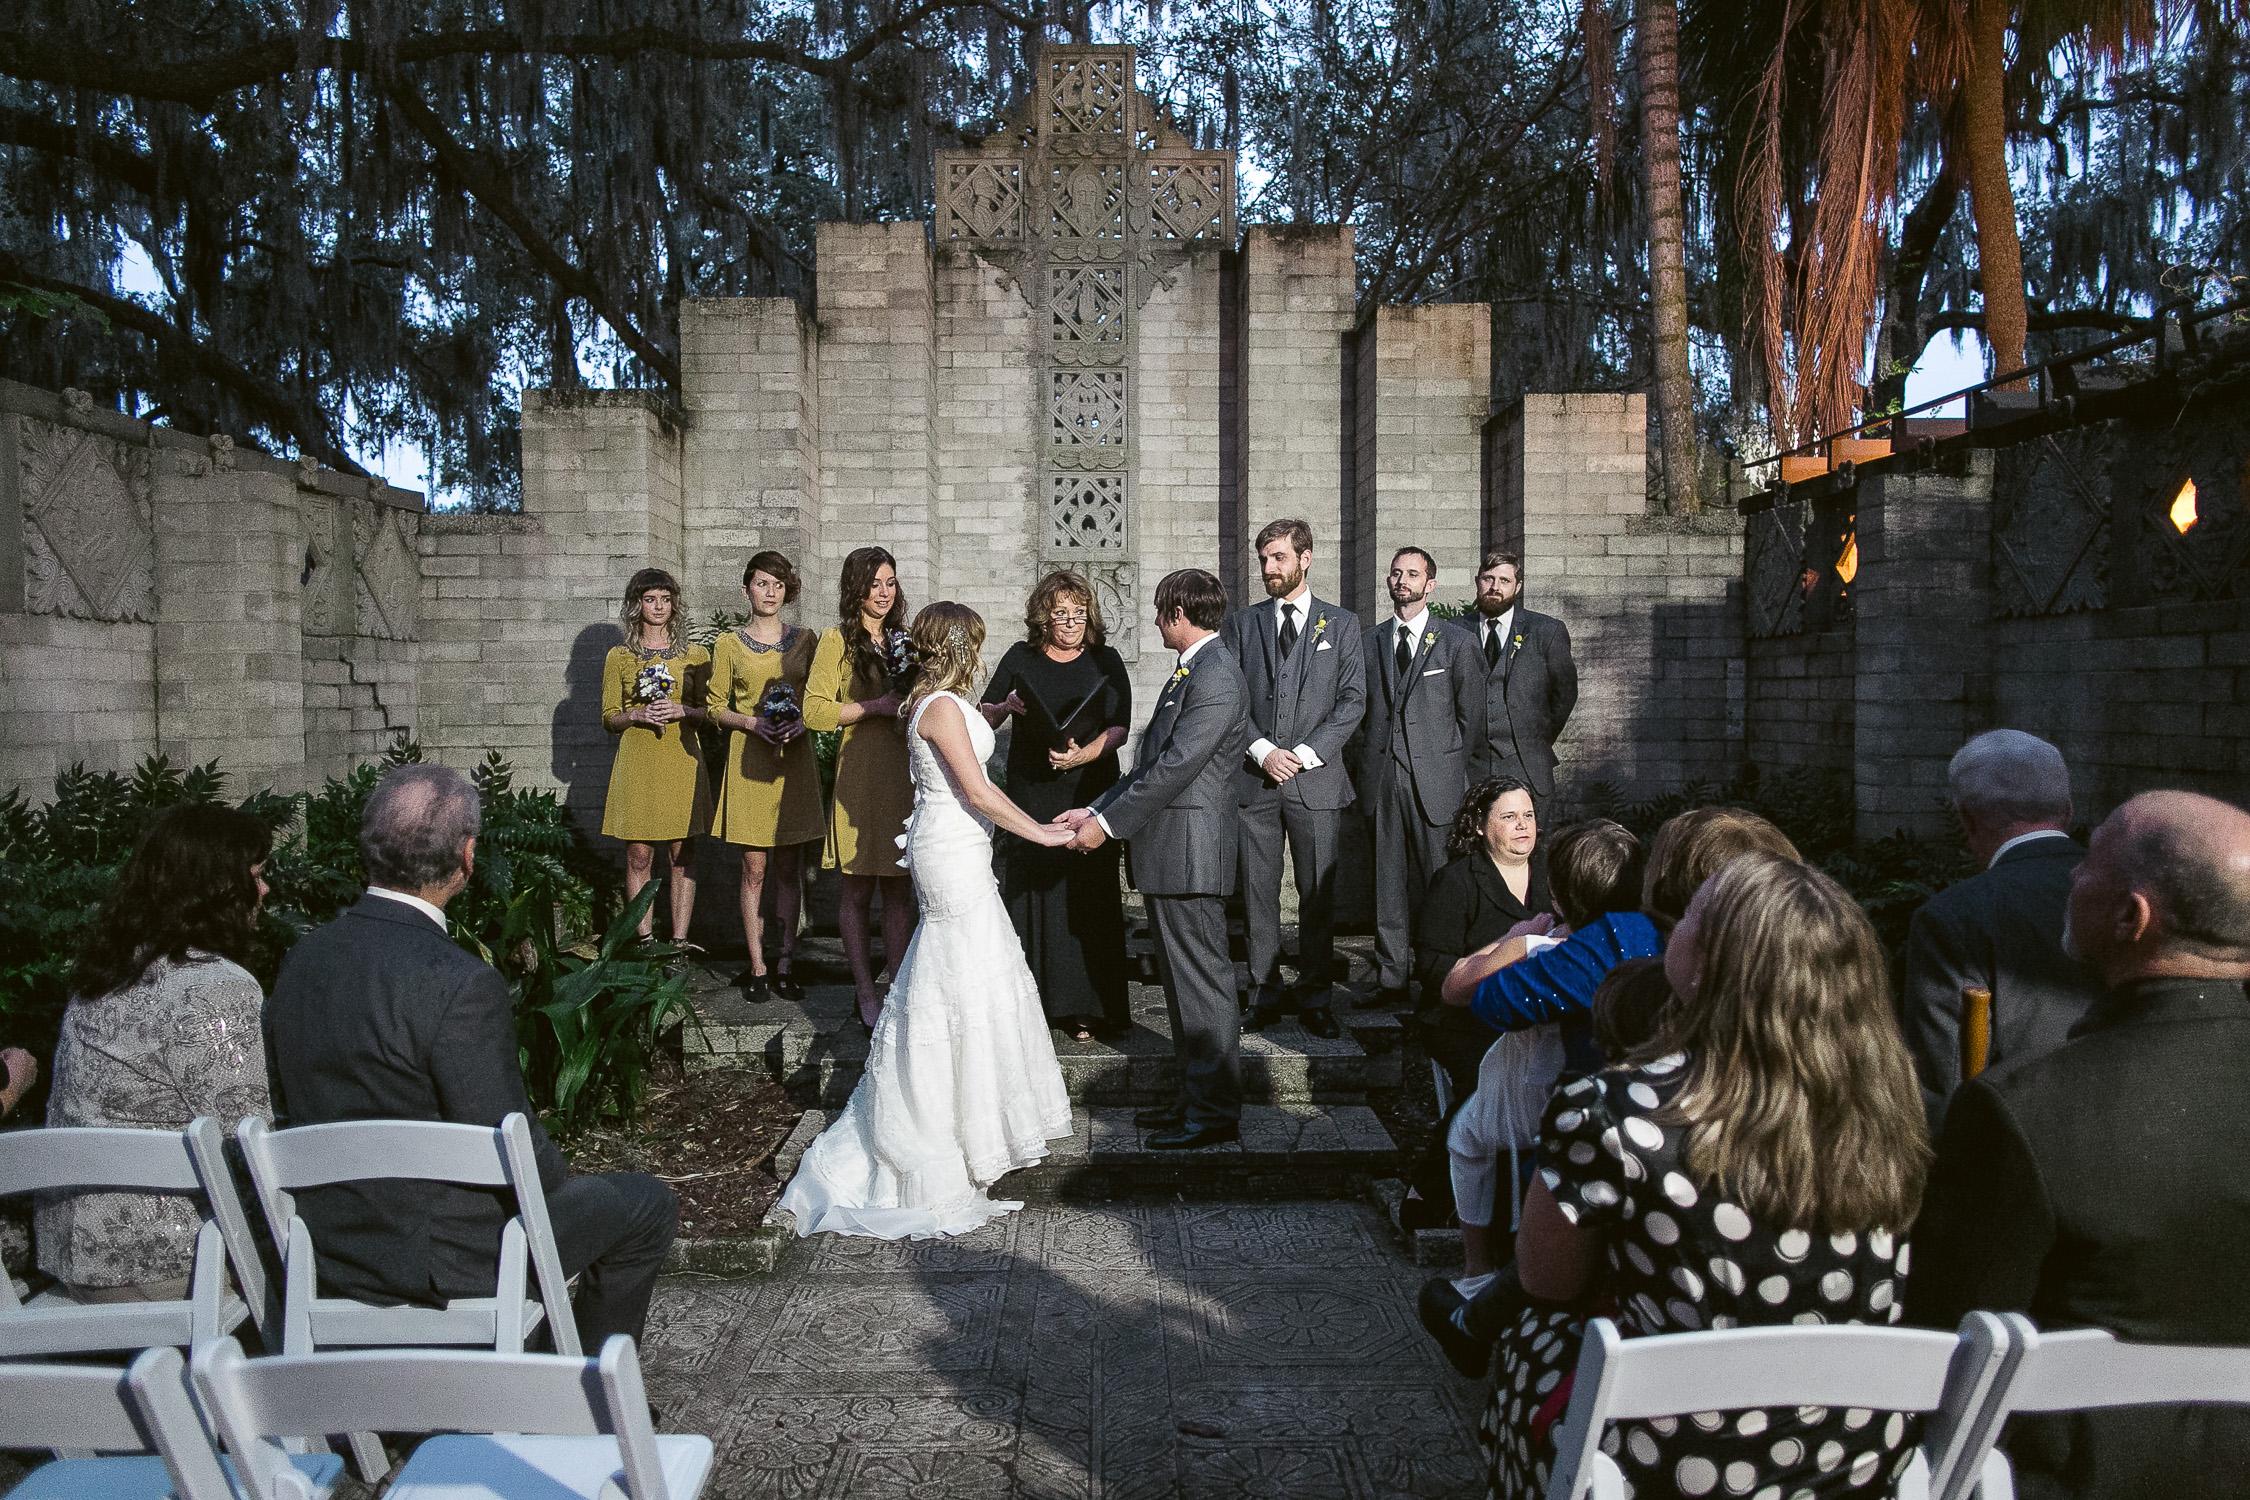 Christina-Matt-Maitland-Art-Center-Wedding69.JPG